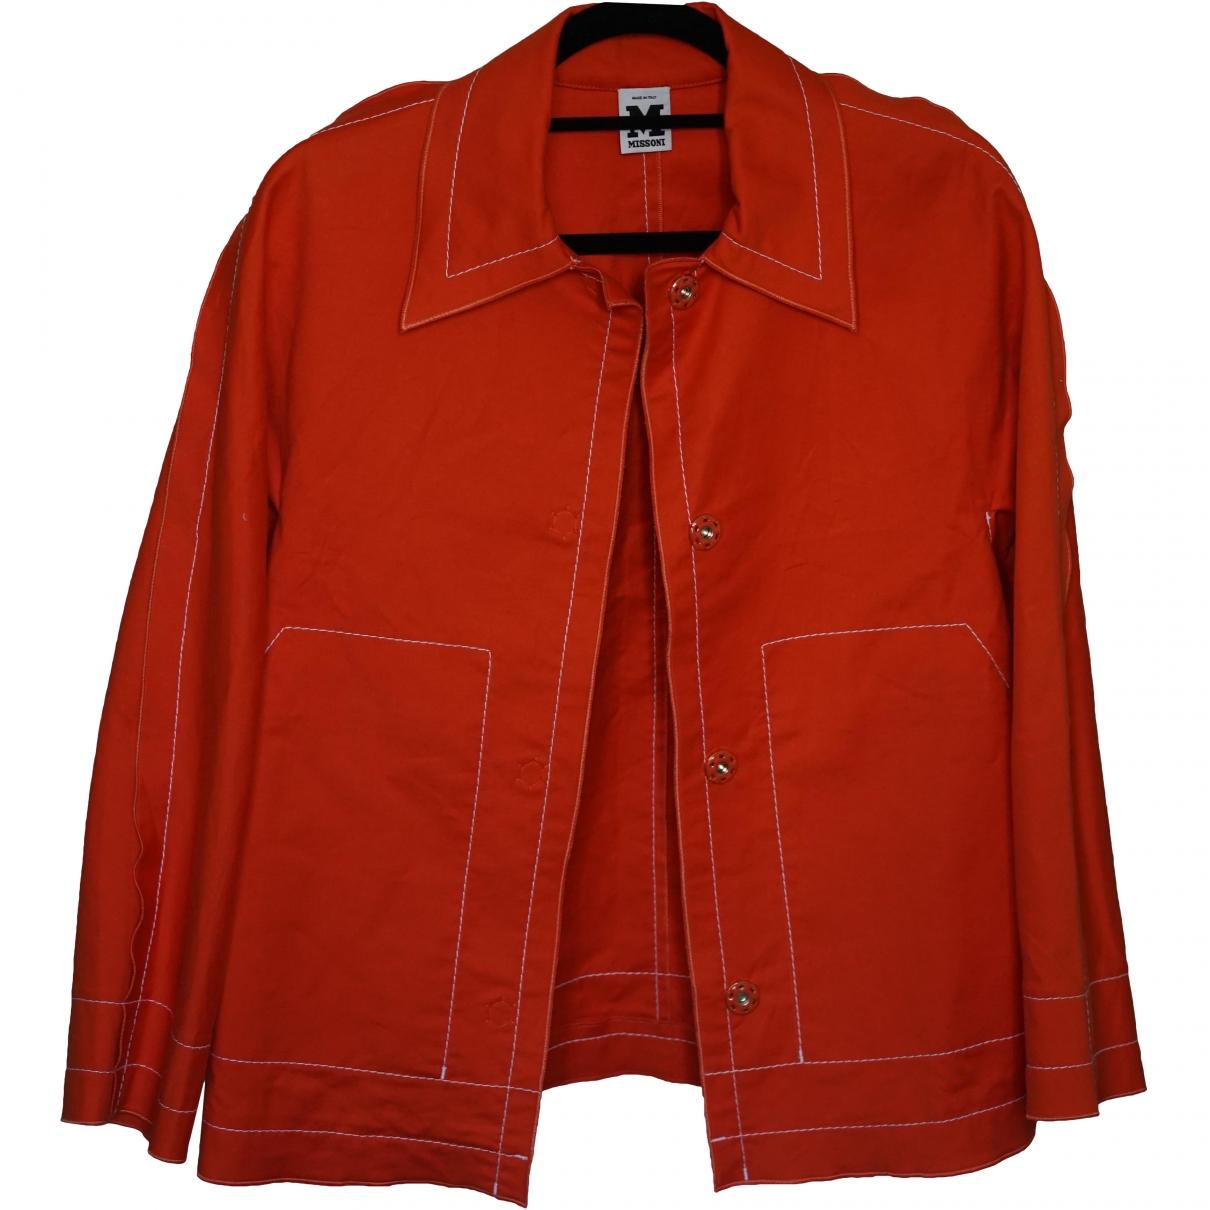 M Missoni \N Orange Cotton jacket for Women 40 IT